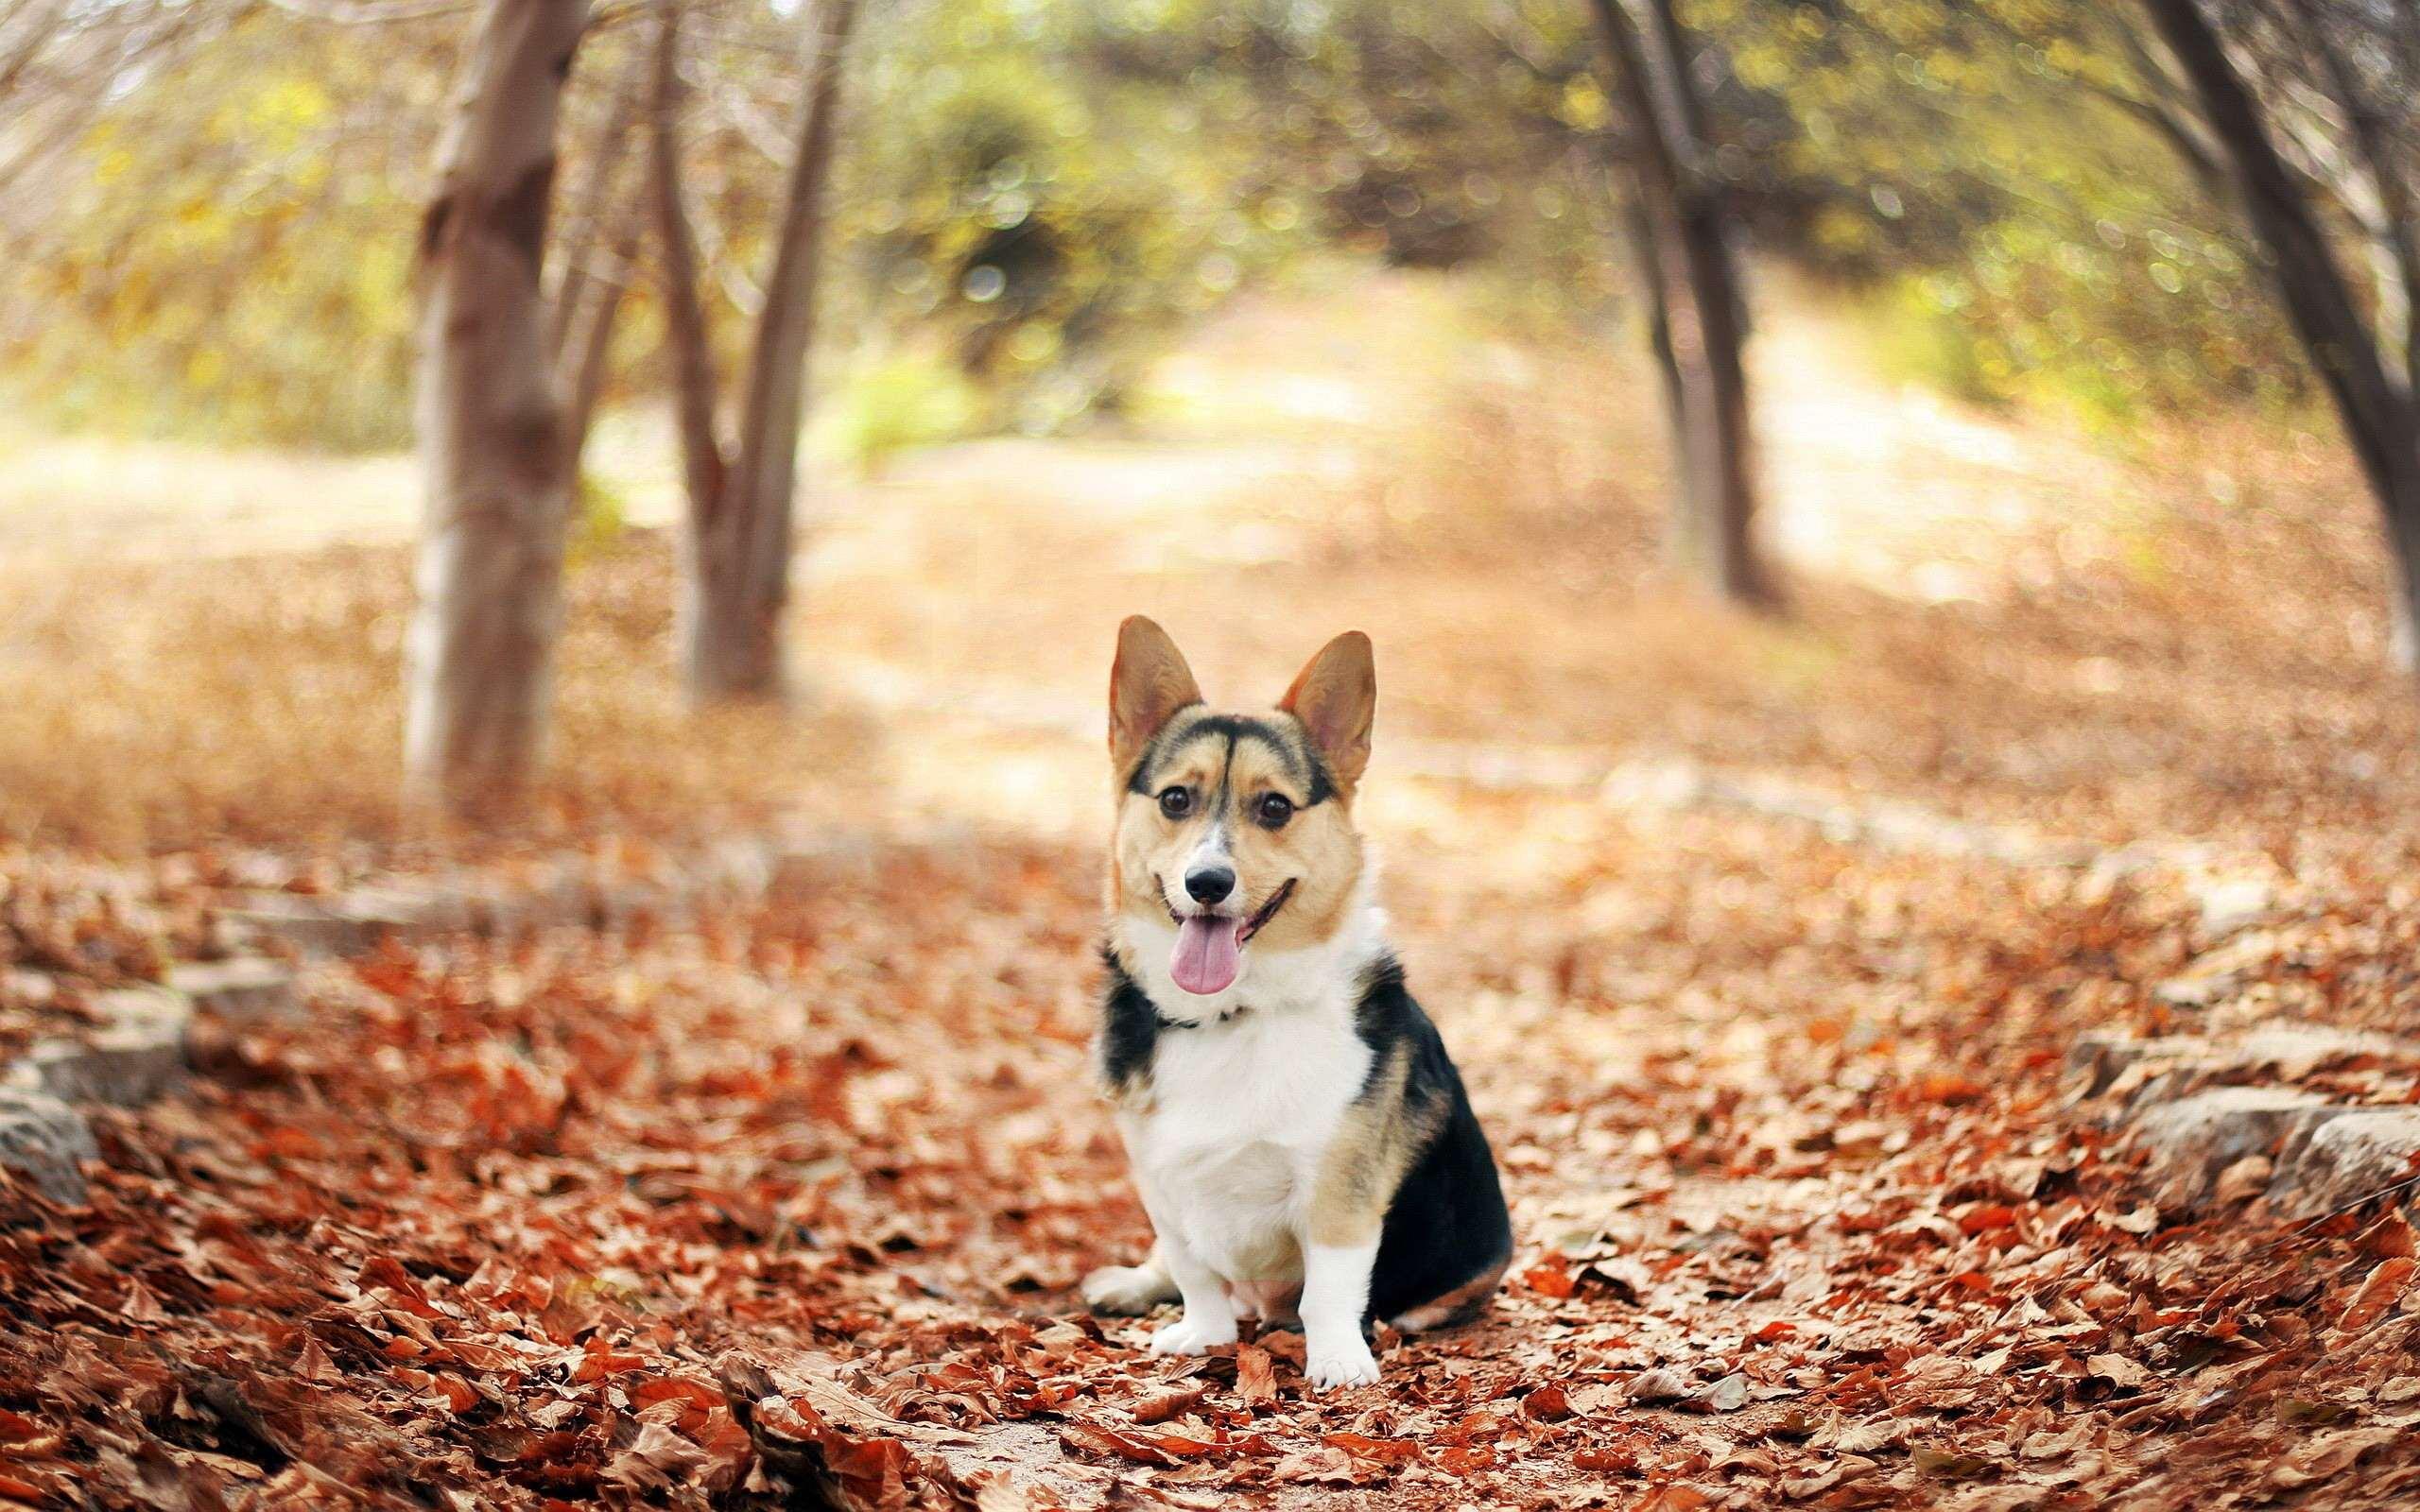 Вельш корги кардиган фото собаки, Вельш корги кардиган ...: http://www.zooclub.ru/wallpaper/20083